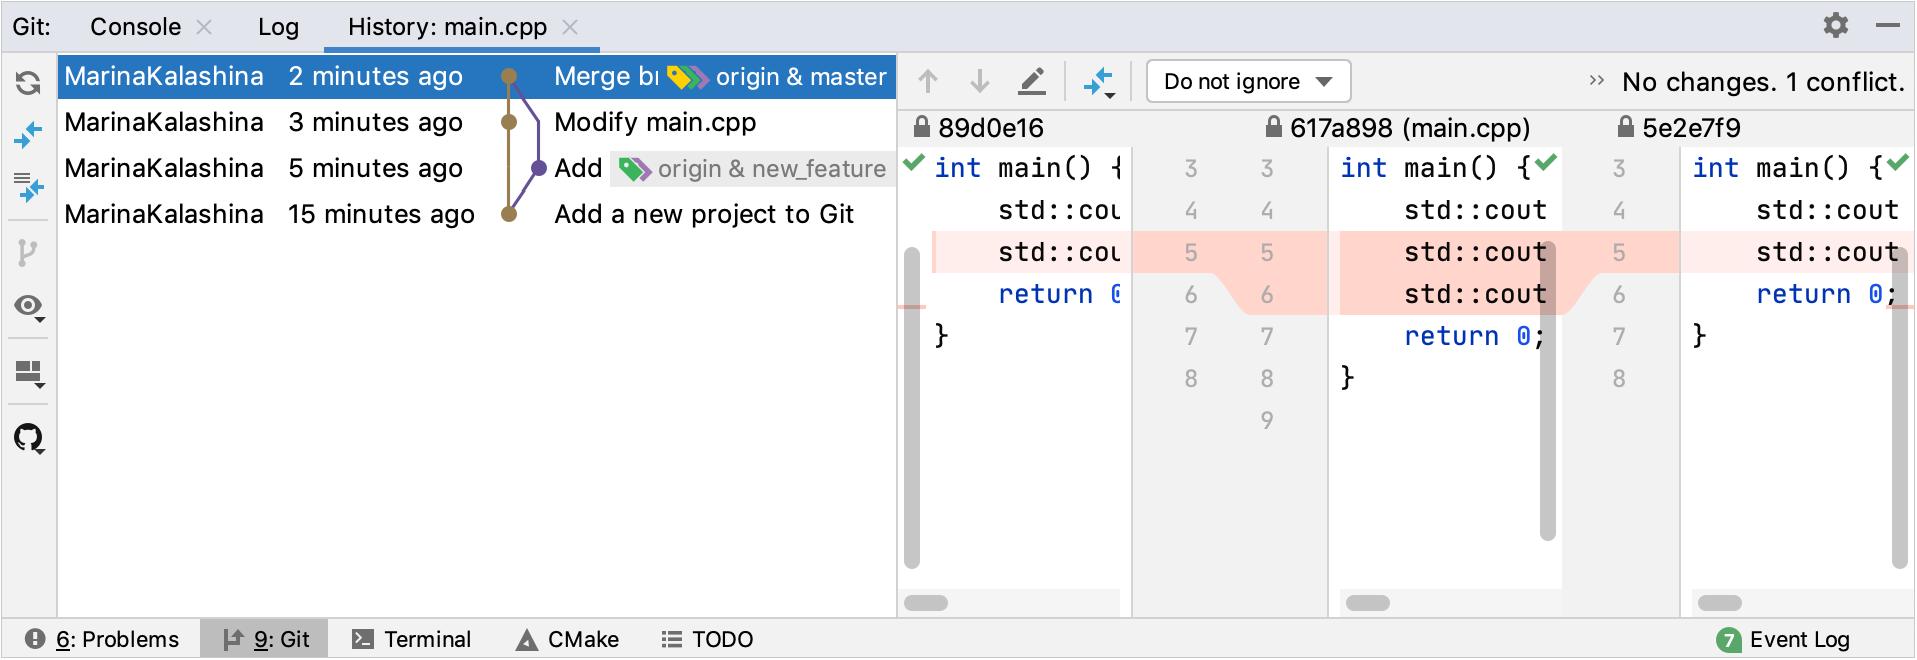 Git file history